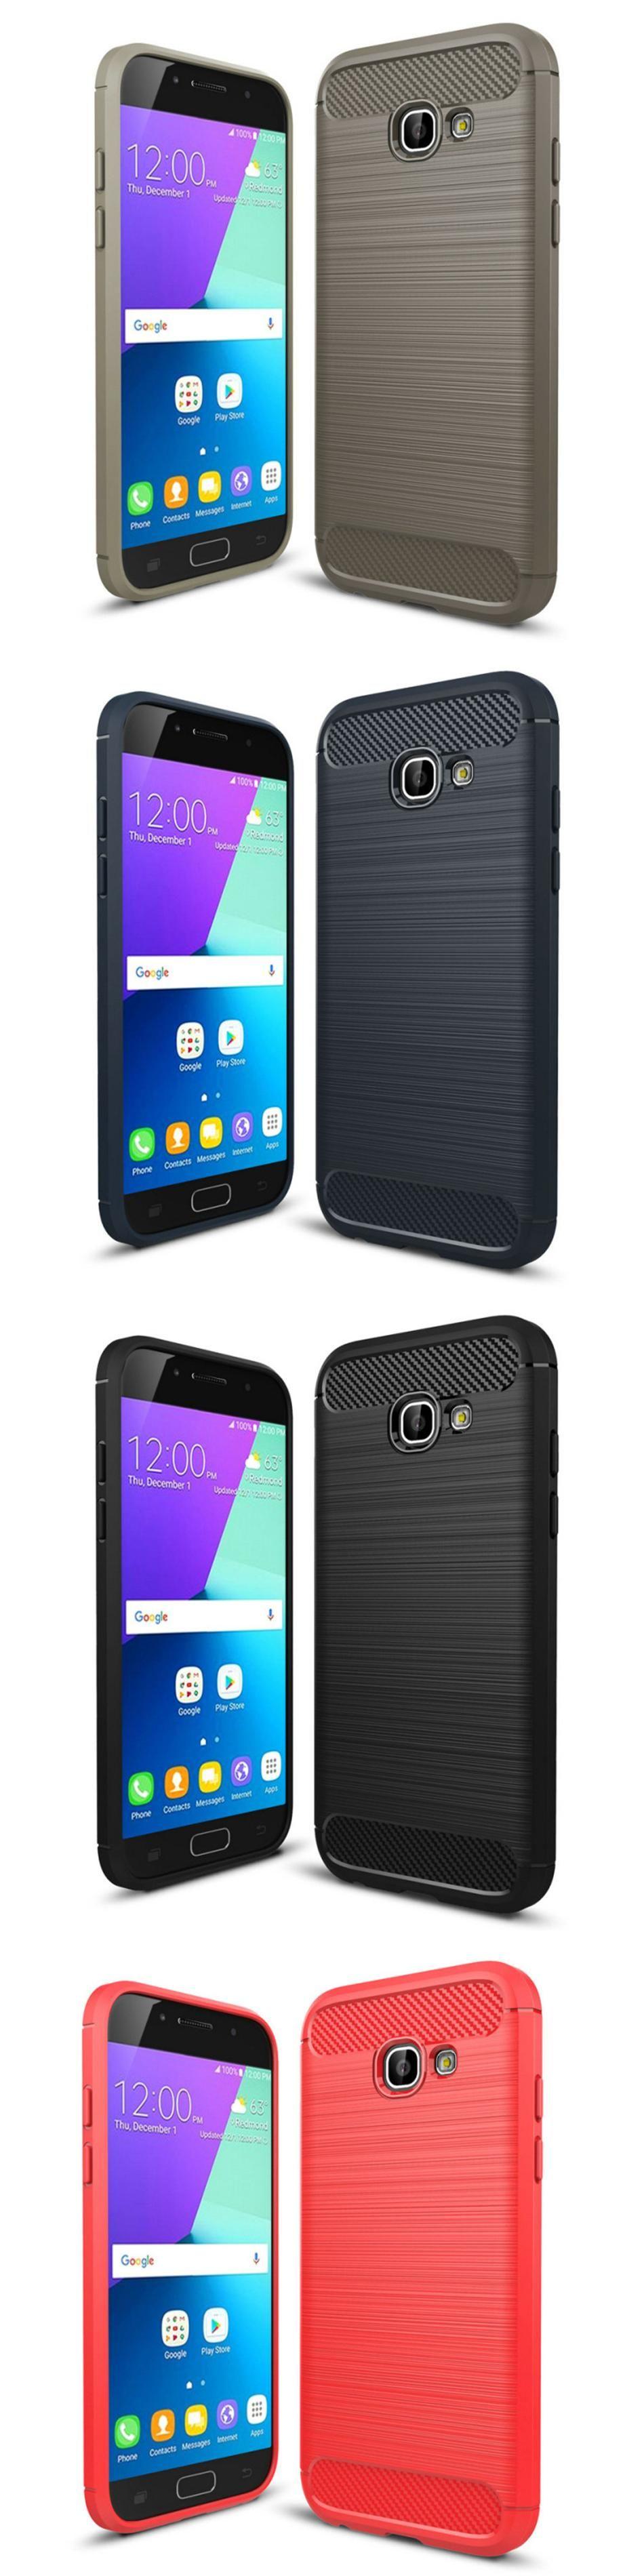 ZUCZUG for Samsung Galaxy A3 A5 A7 2017 A320 A520 A720 Soft Silicone Carbon Fiber Textured